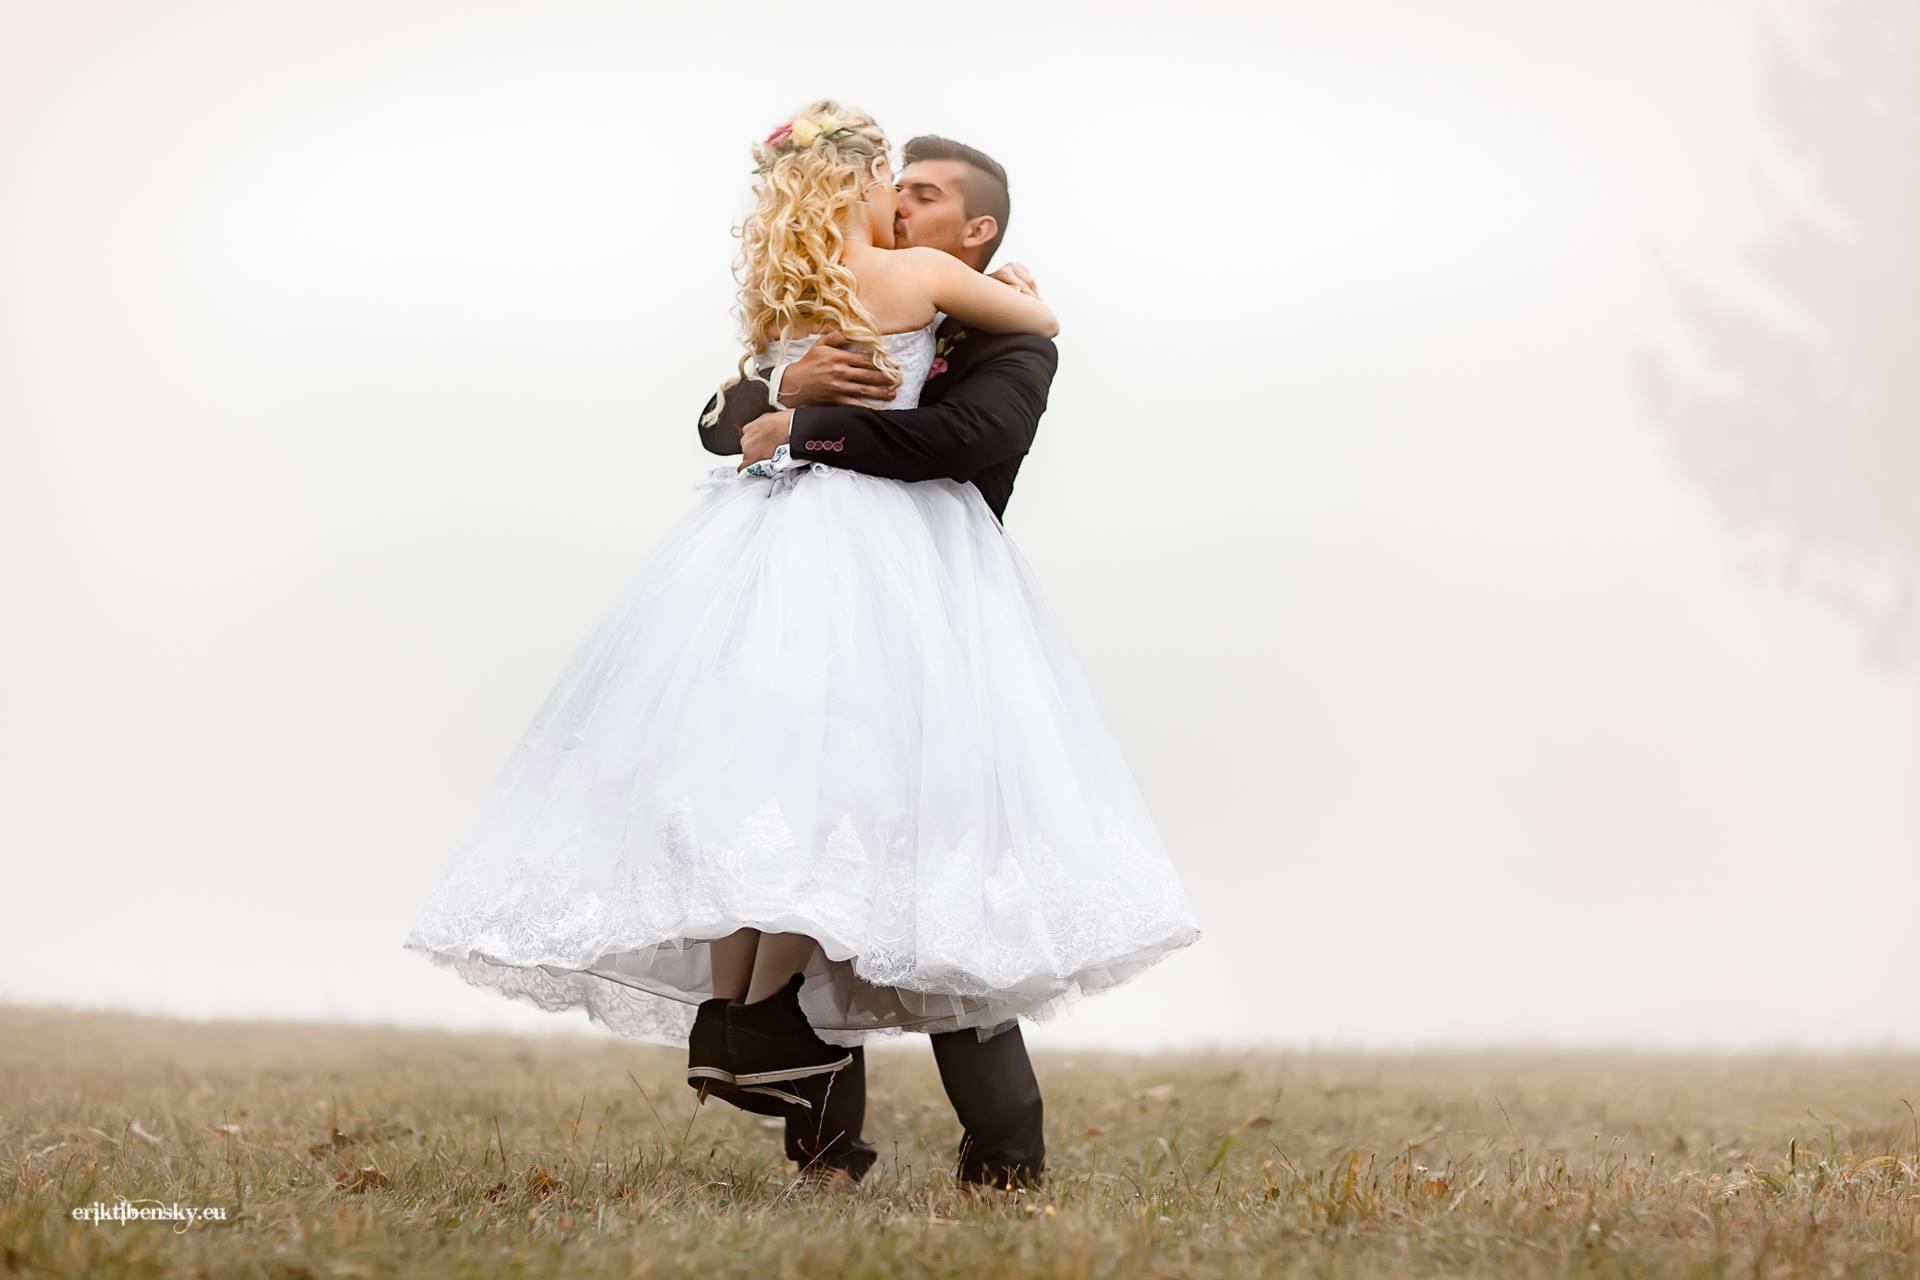 eriktibensky-eu-fotograf-wedding-photo-svadba-svadobny-pezinok-bratislava-modra-senec-1011